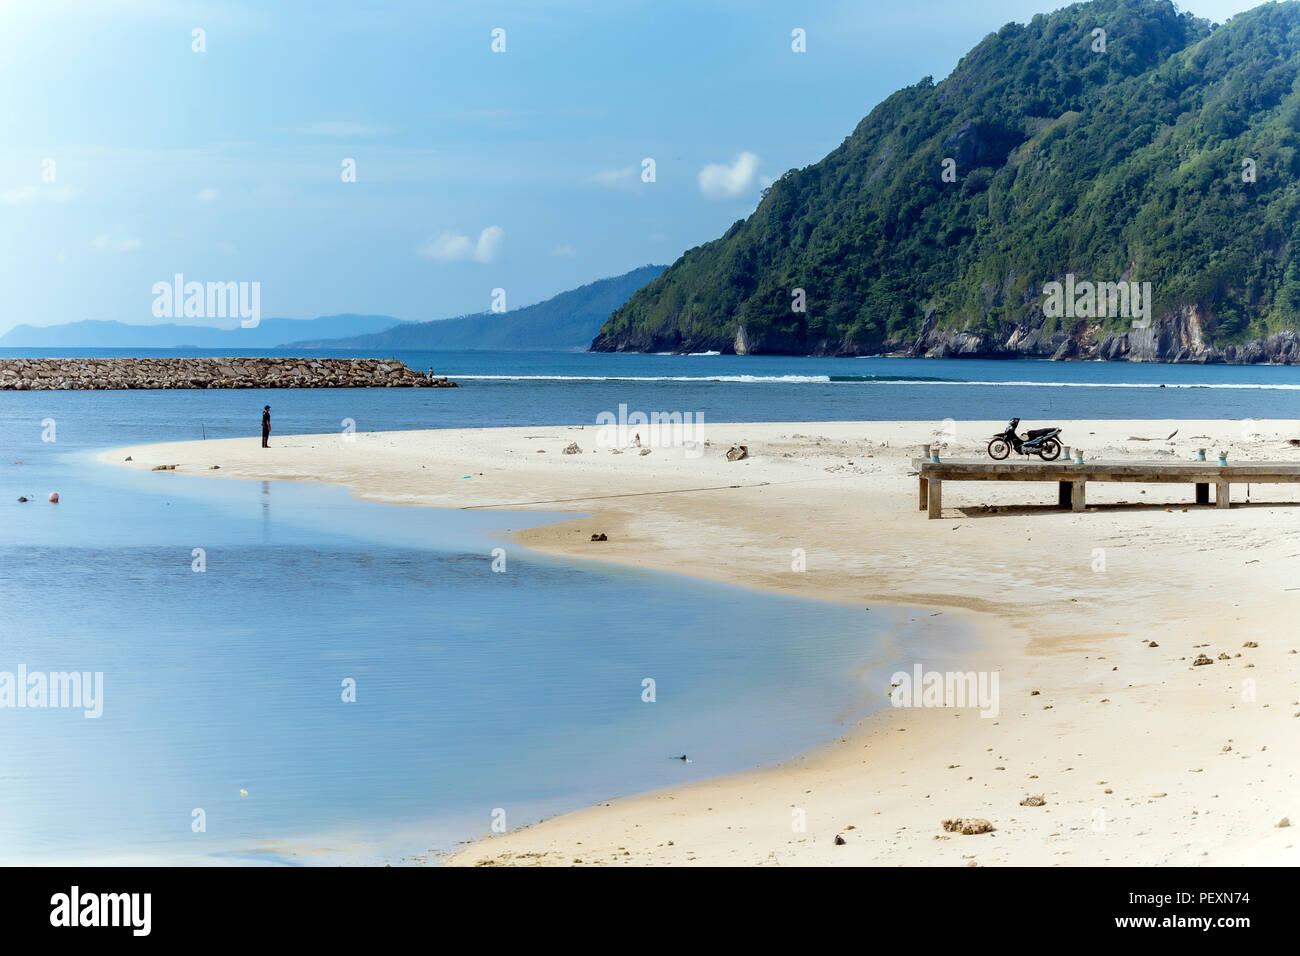 View of beach, Banda Aceh, Sumatra, Indonesia - Stock Image